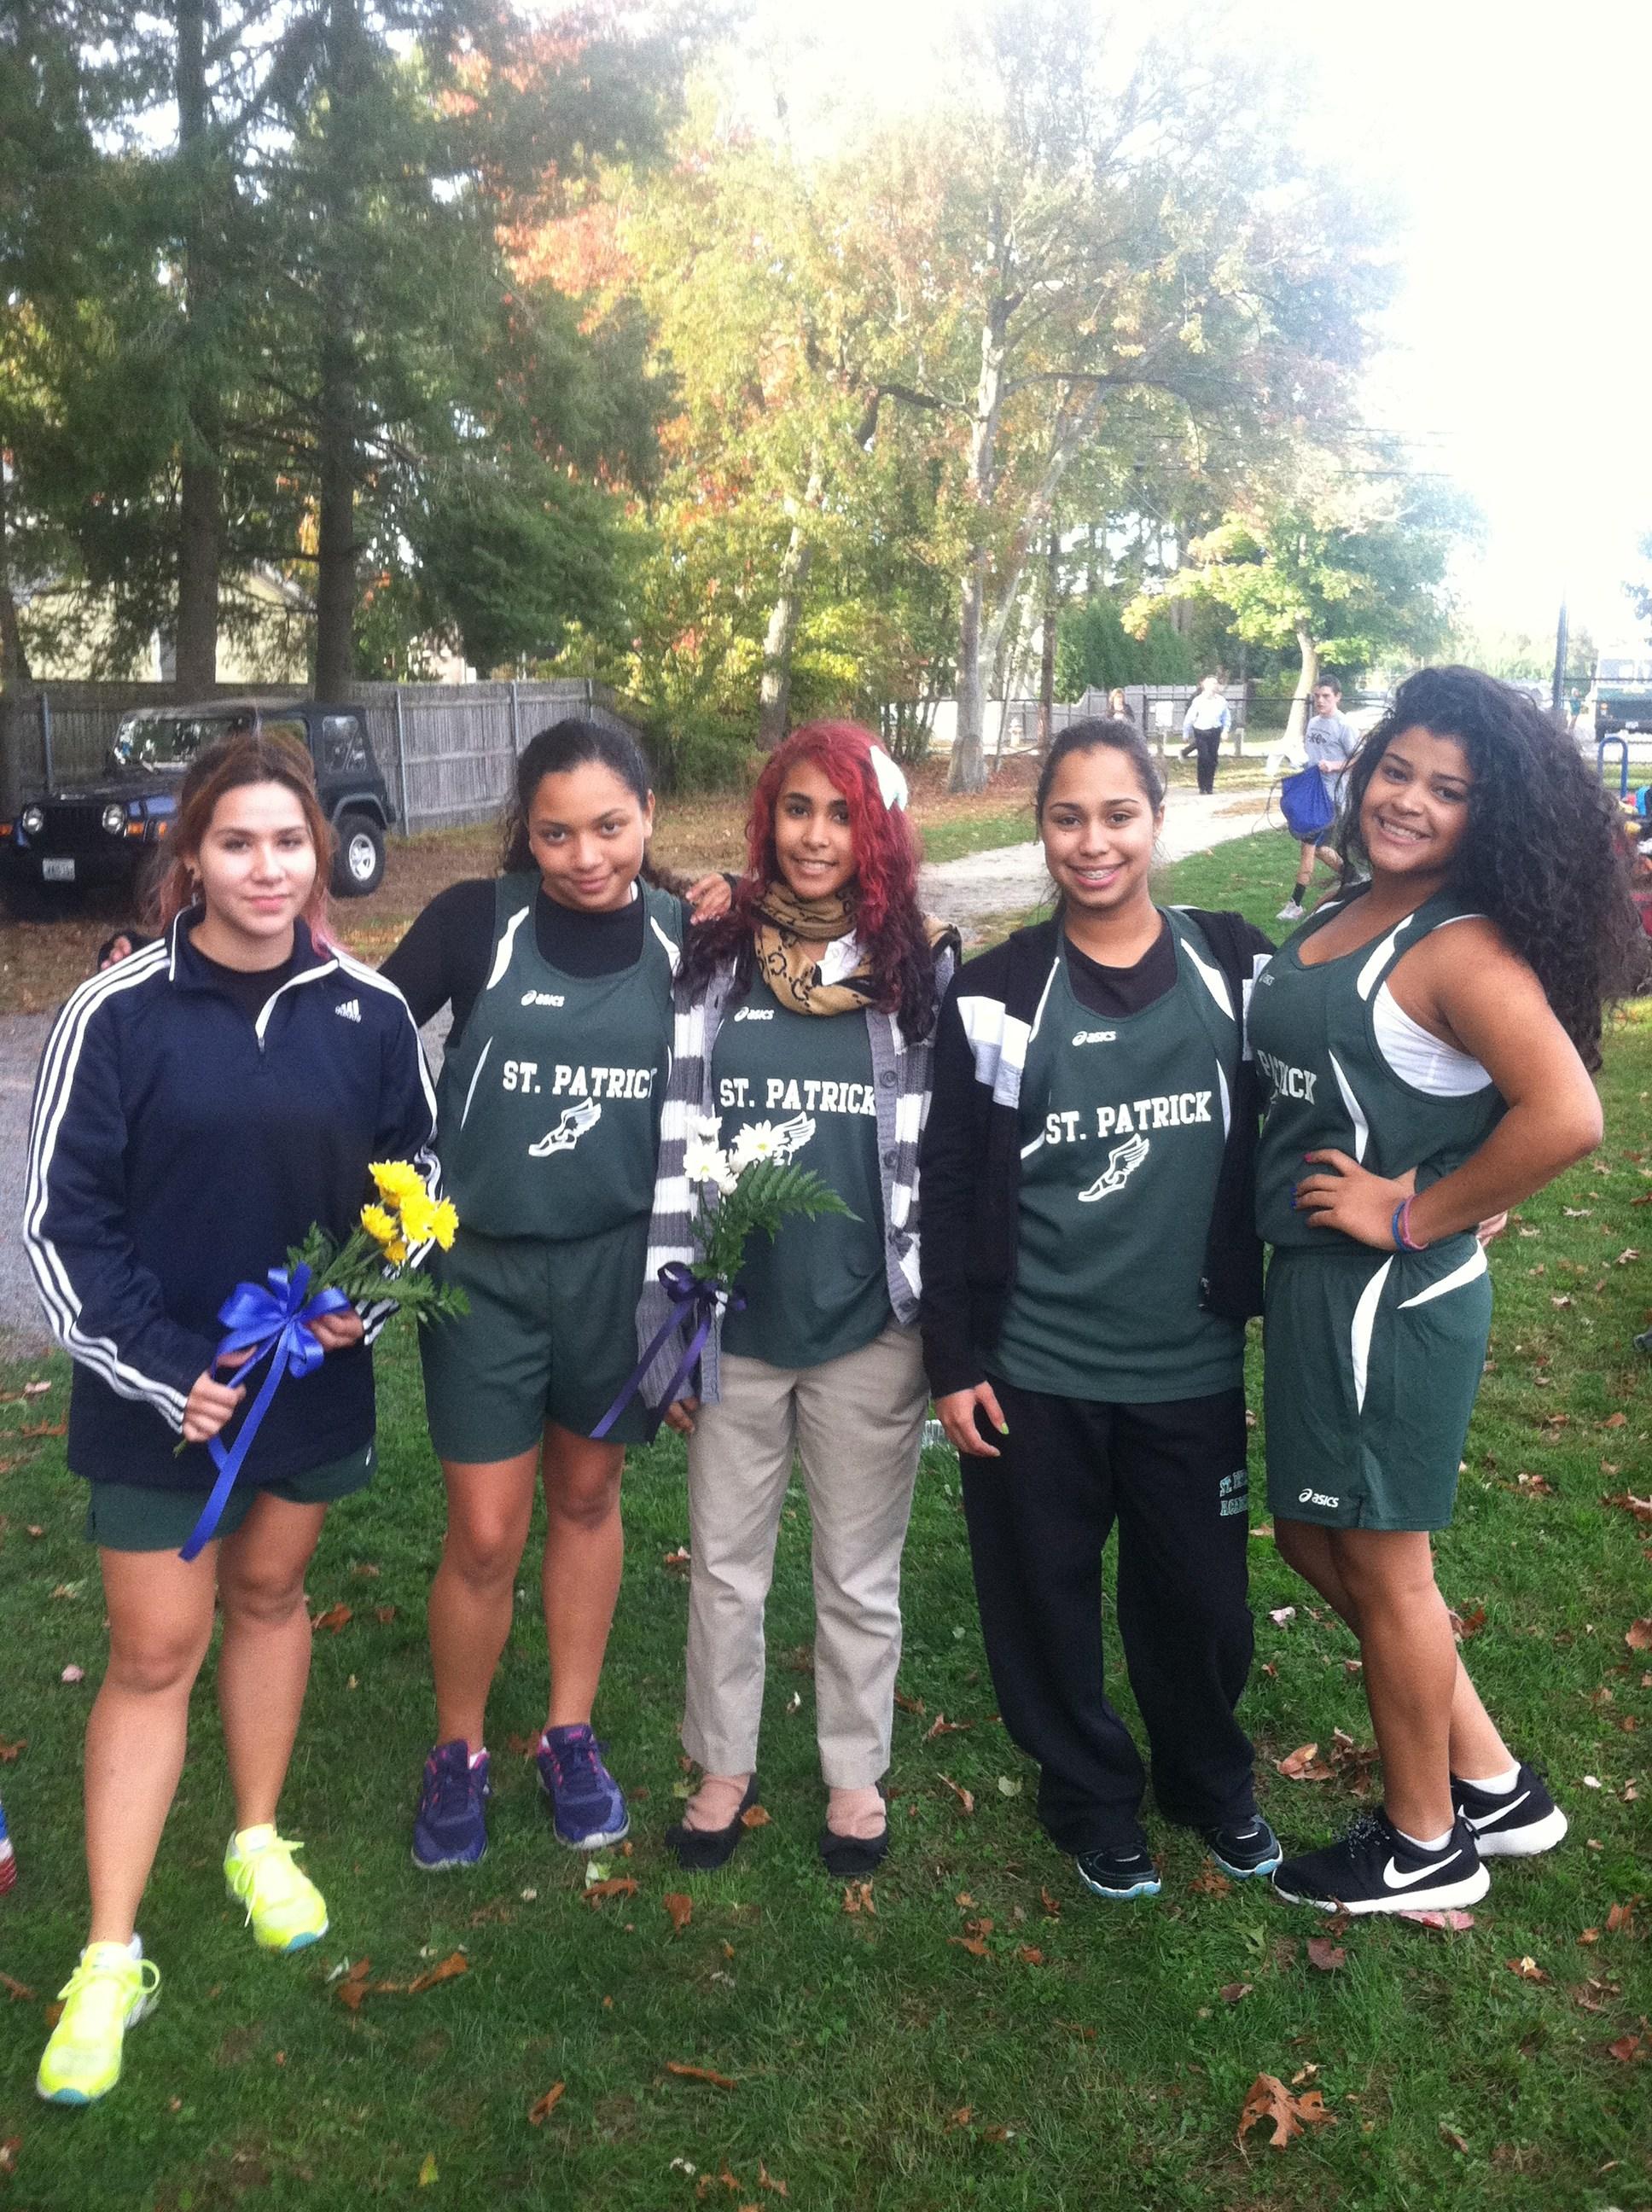 Augustana Cheerleading: St. Patrick Academy